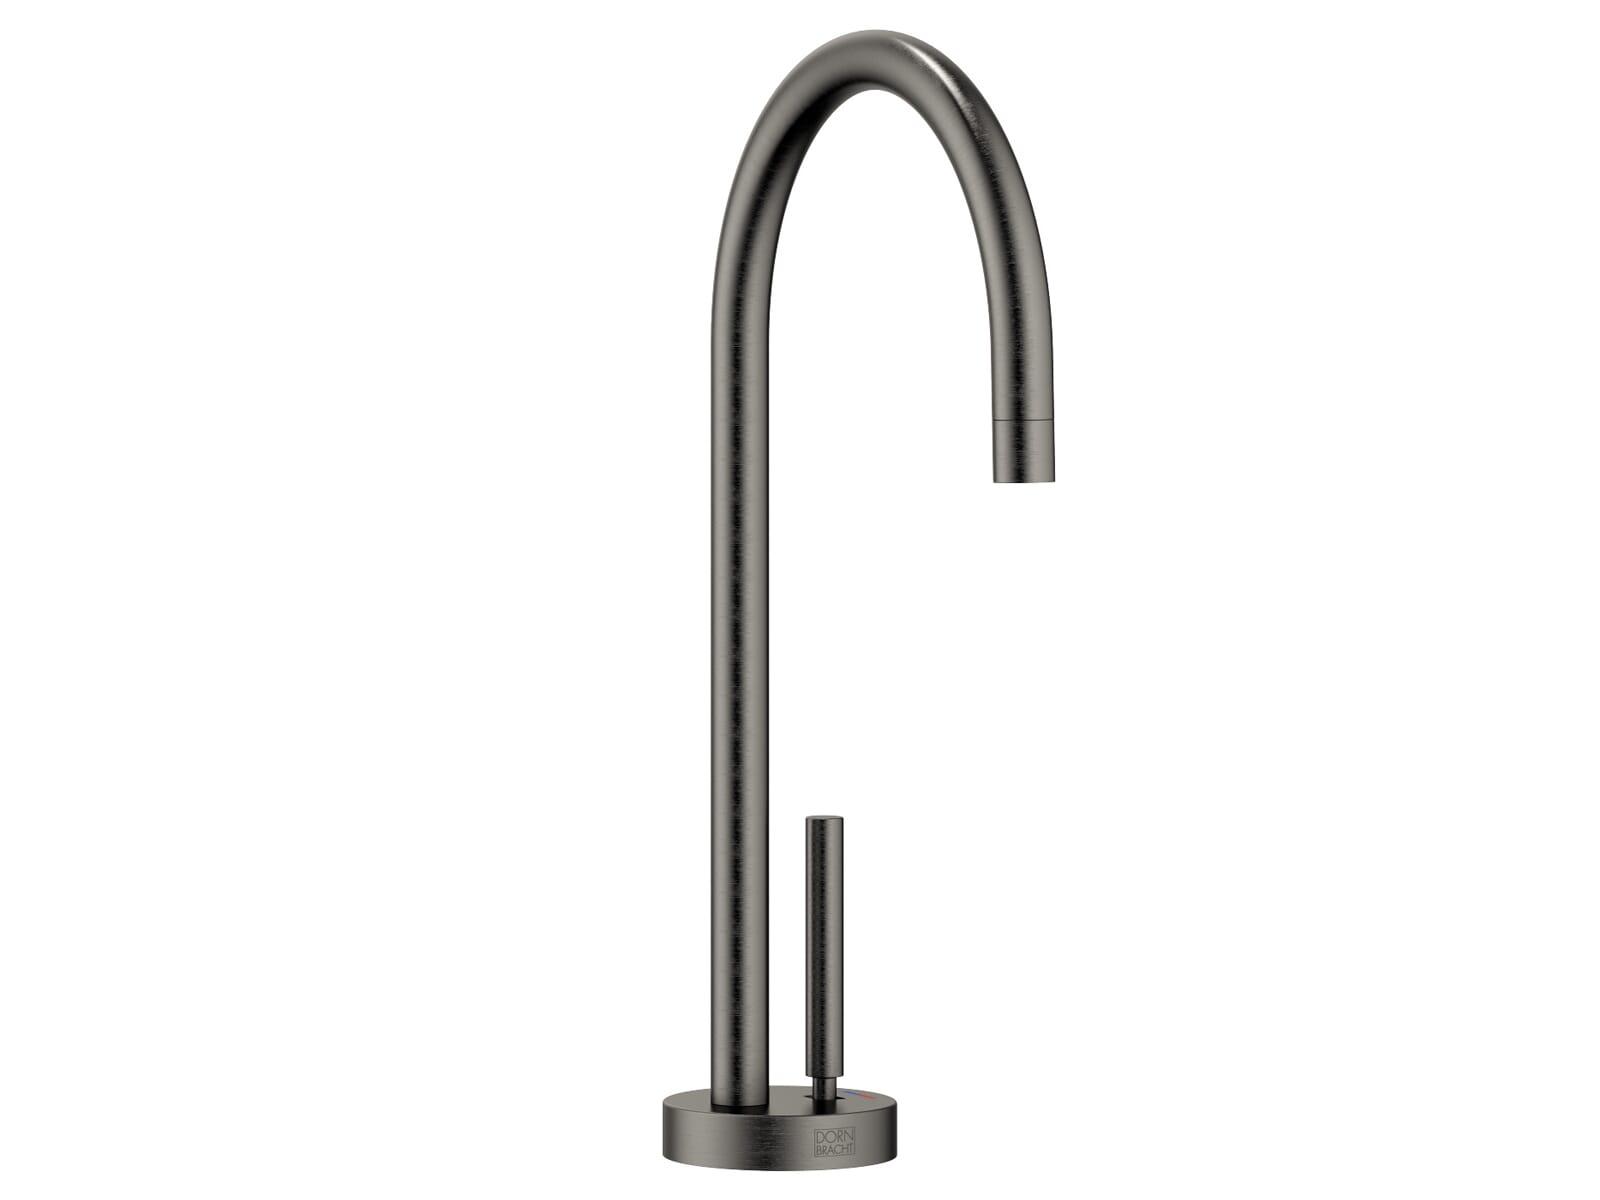 Dornbracht Tara Classic Hot & Cold Water Dispenser Dark Platinum Matt 17 861 888-99 Hochdruckarmatur